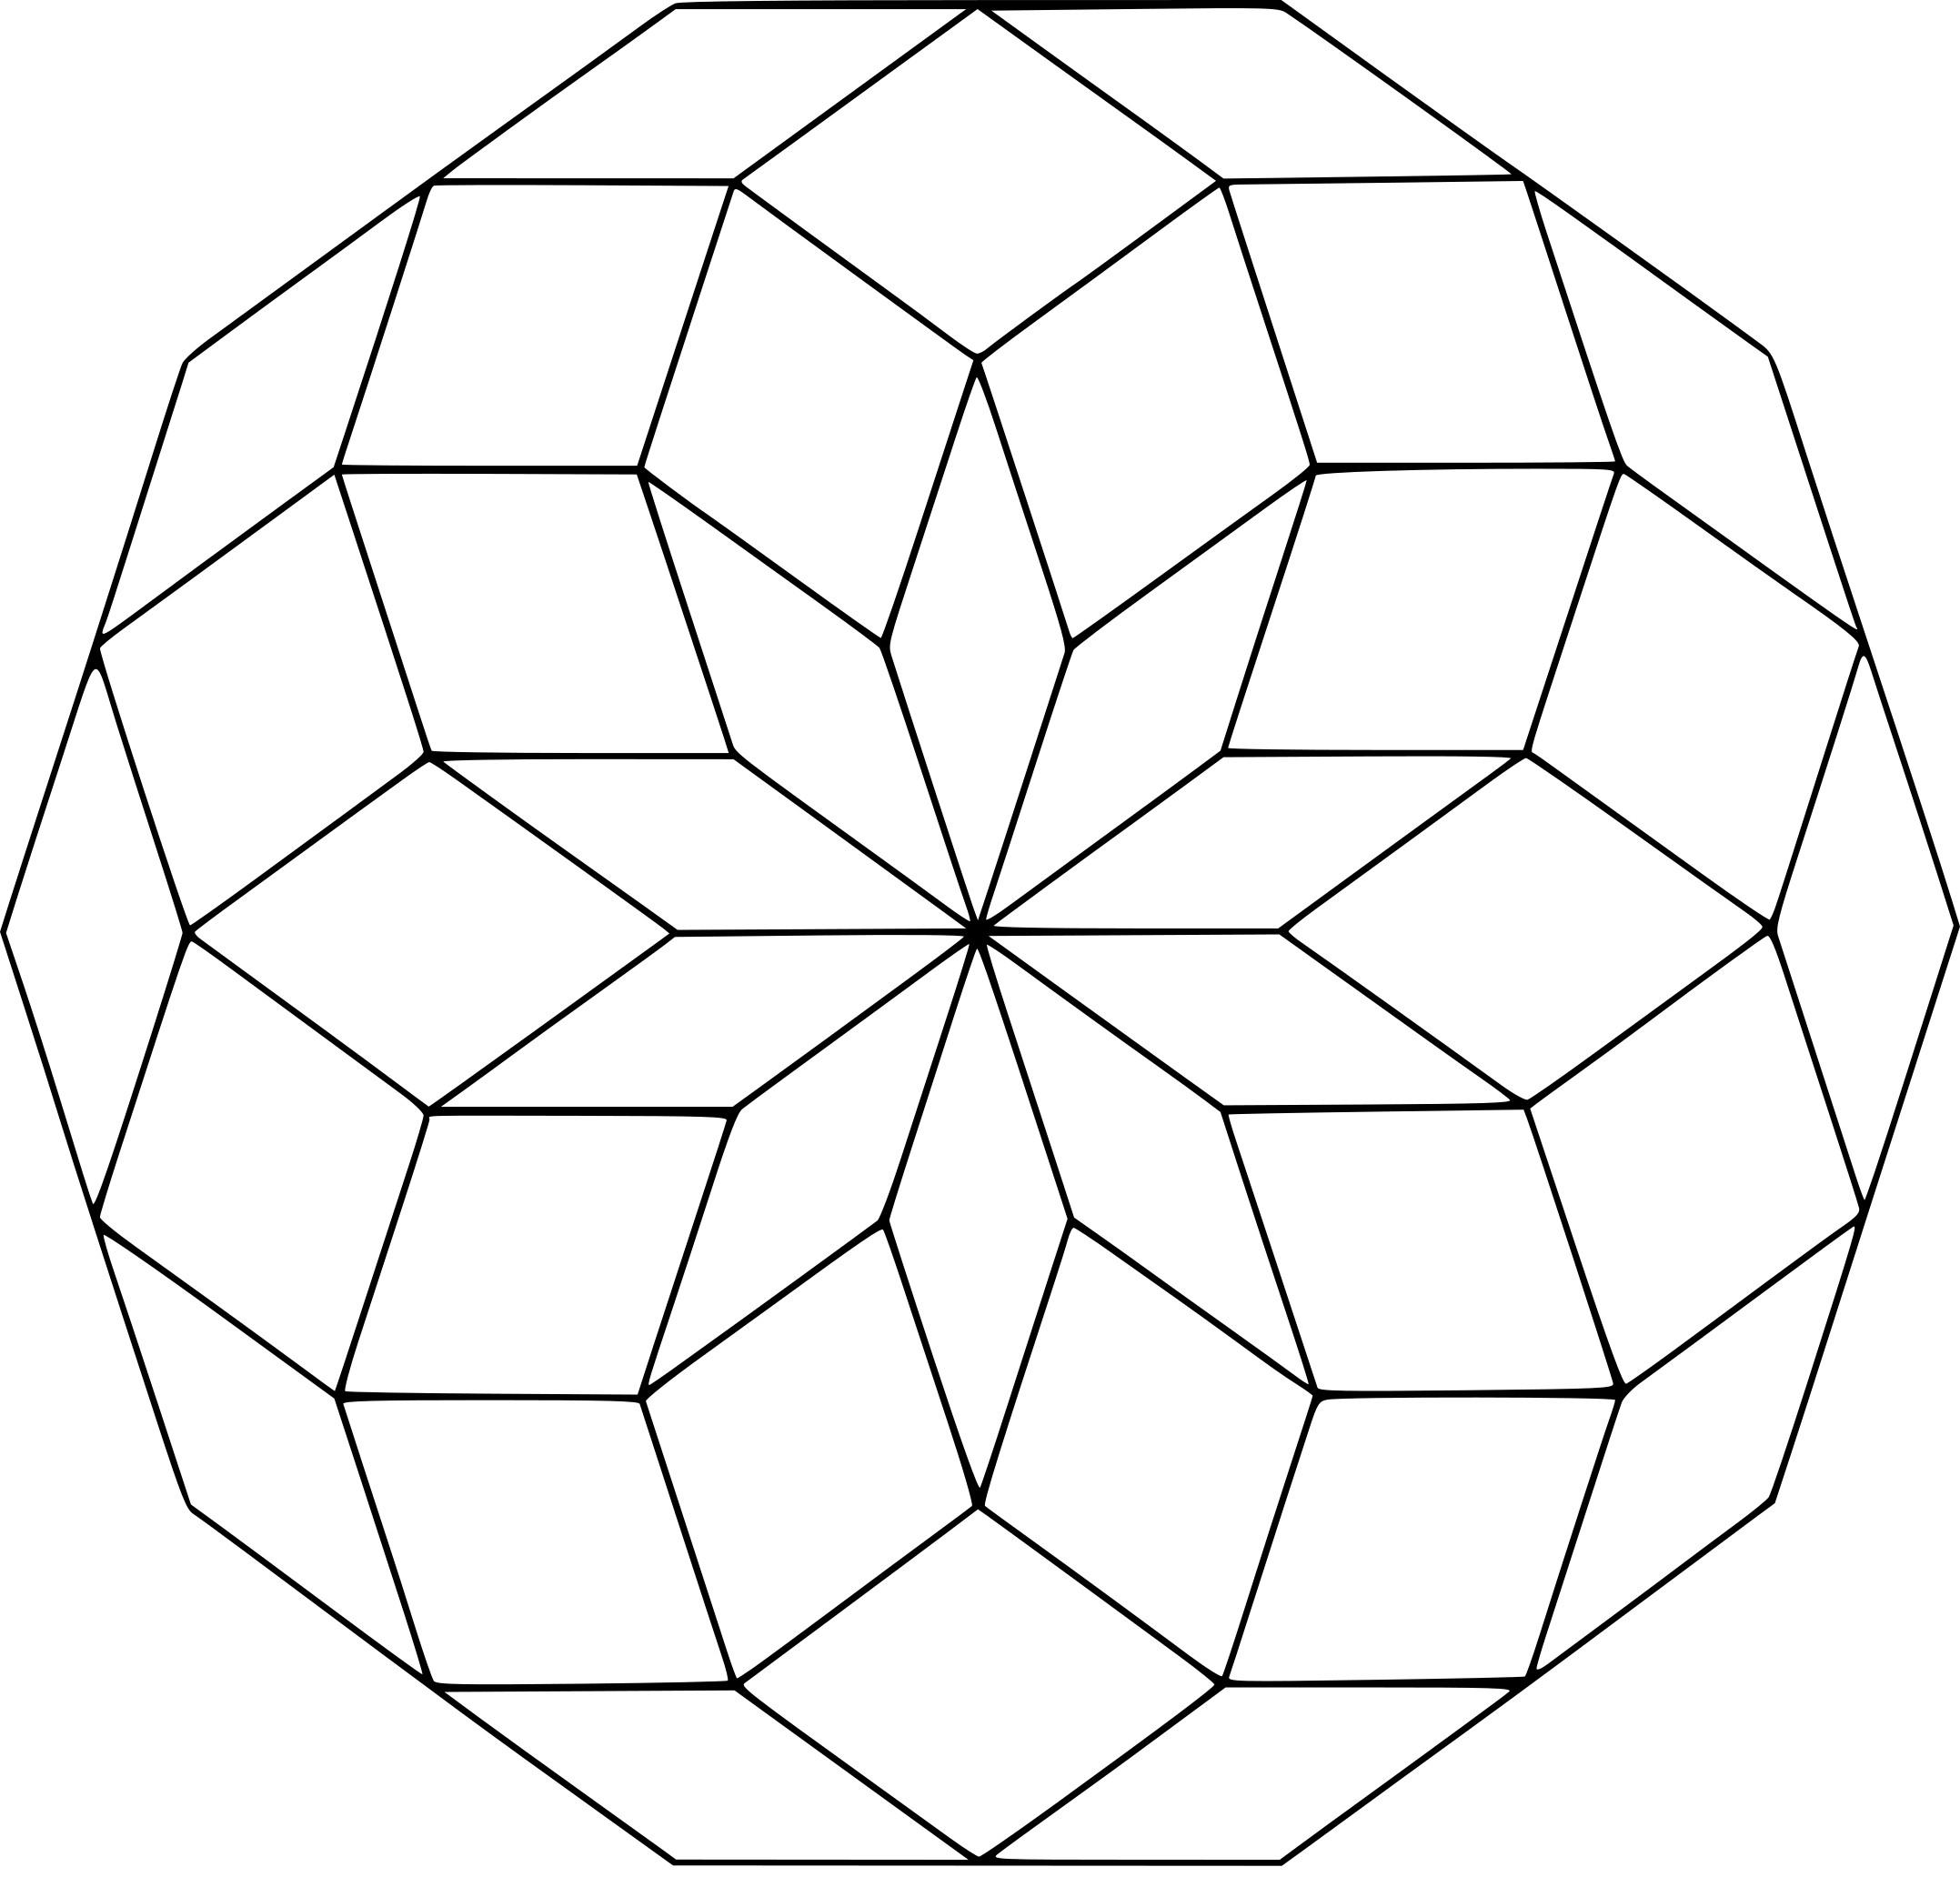 Coloriage Mandala 3D À Imprimer serapportantà Mandala À Colorier Et À Imprimer Gratuit